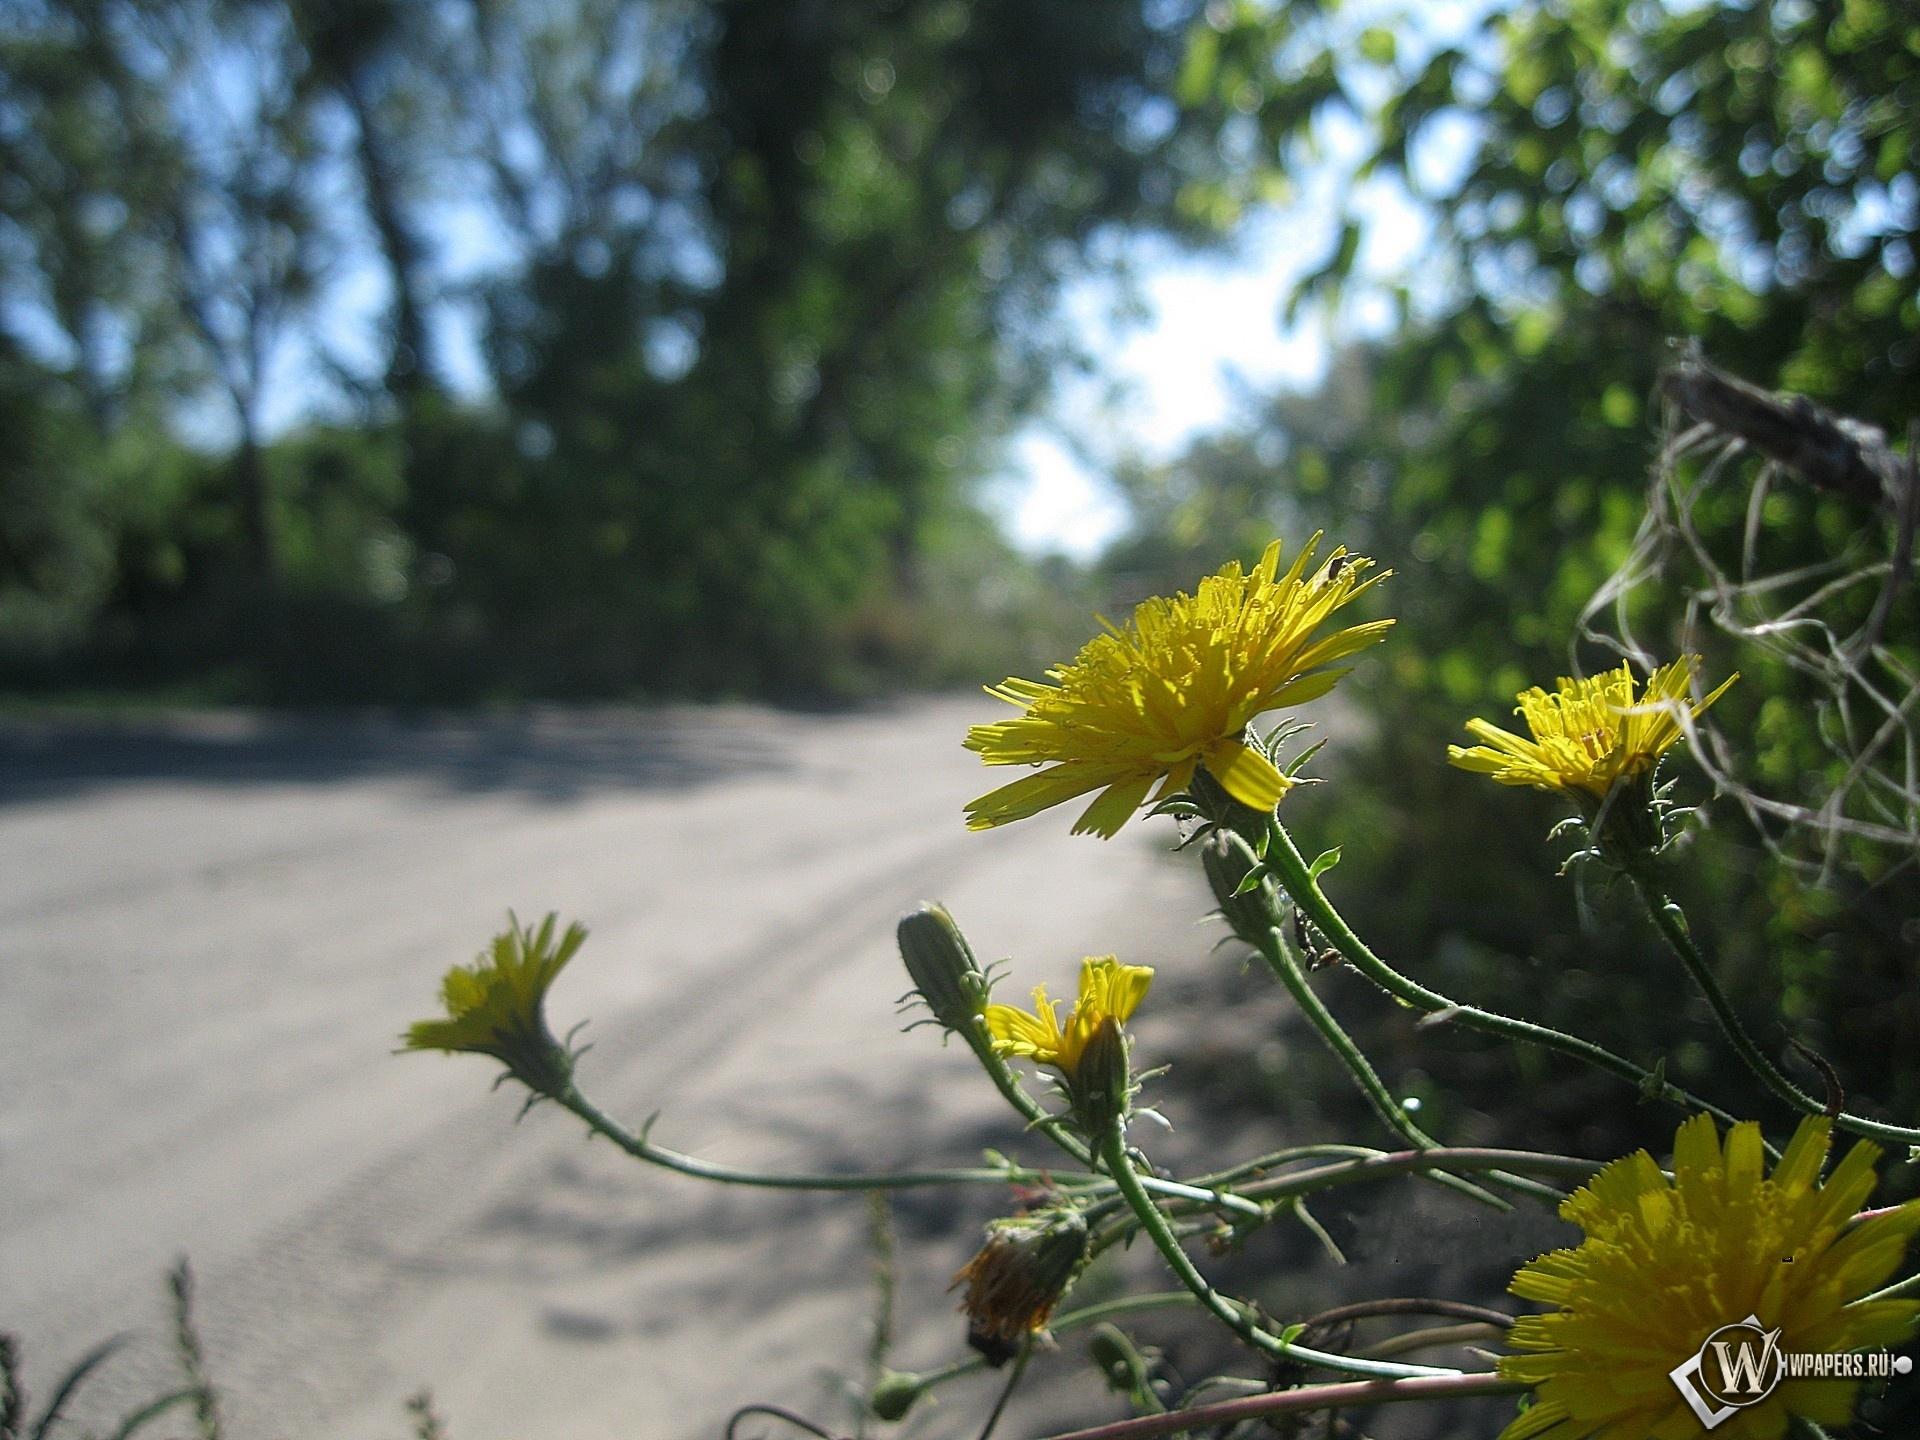 Цветы у дороги 1920x1440